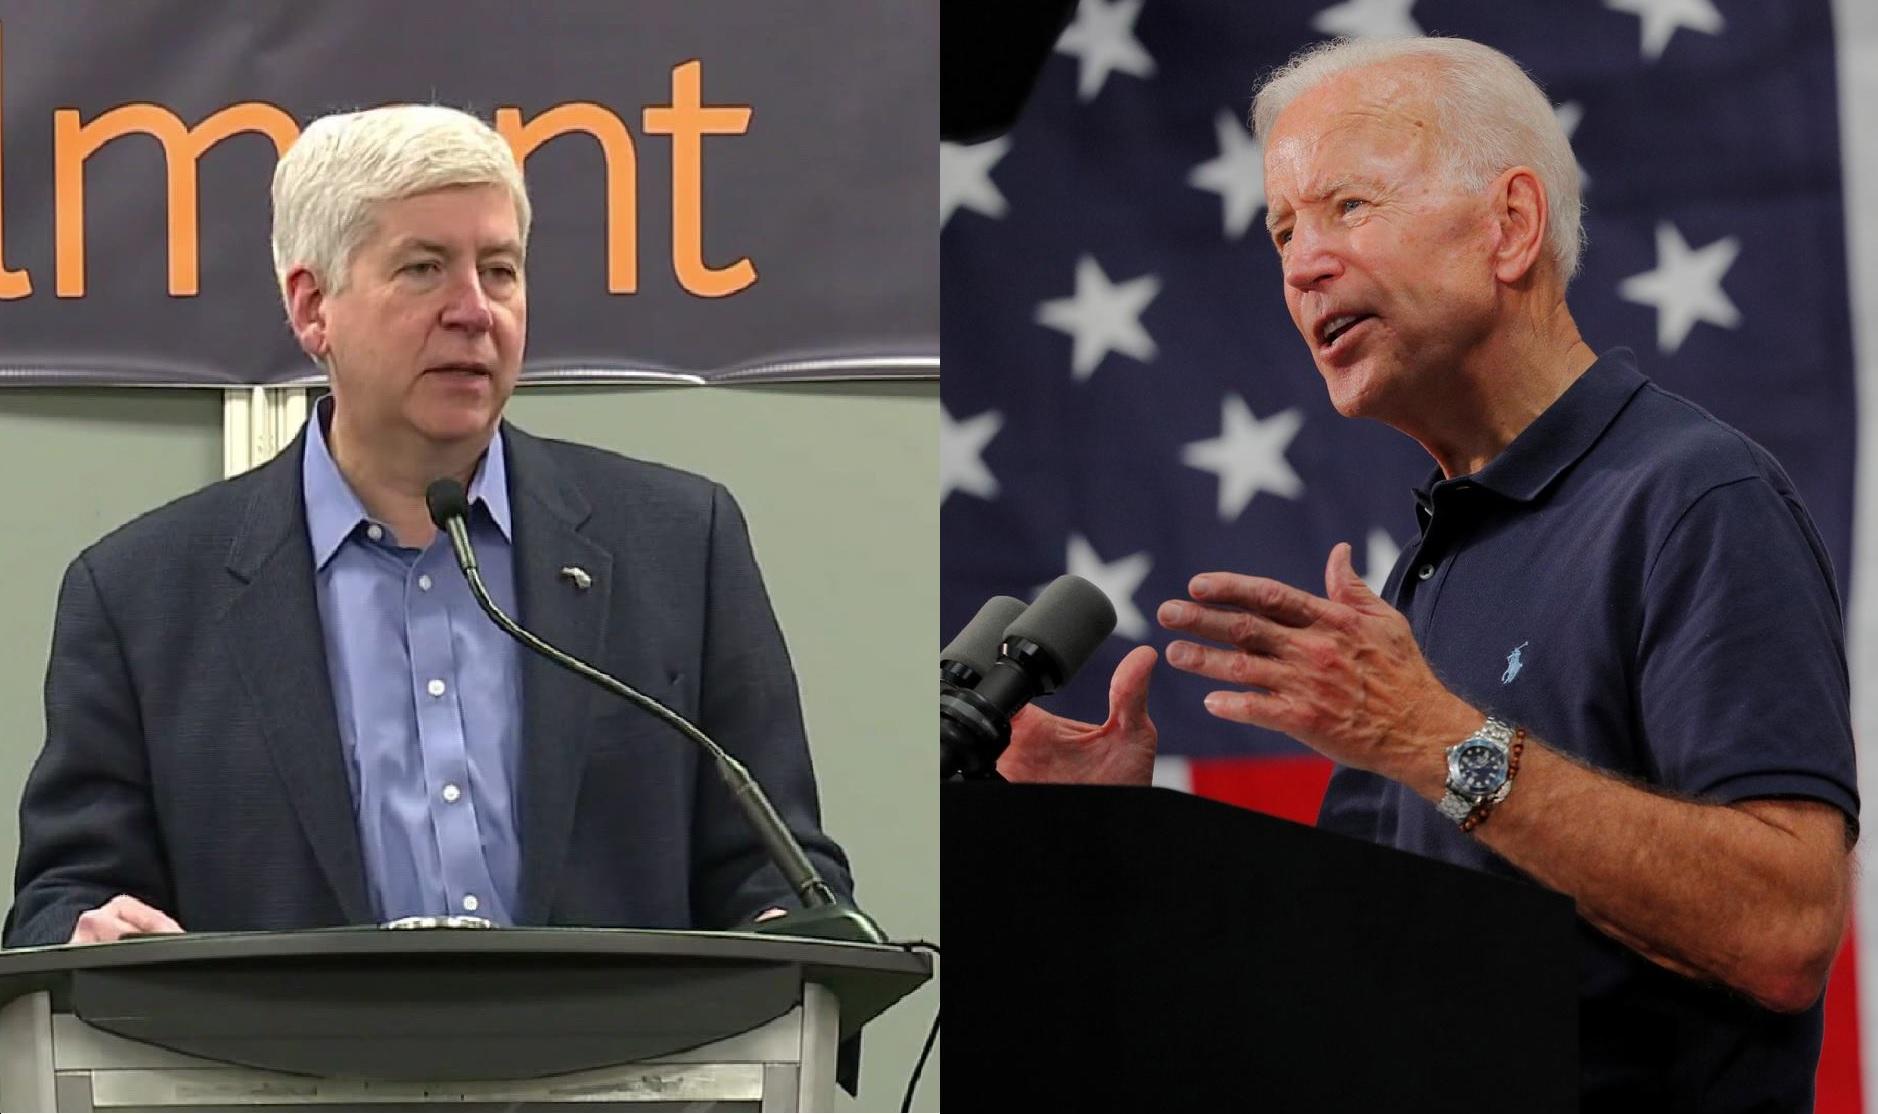 Biden, Endorsement from Rick Snyder